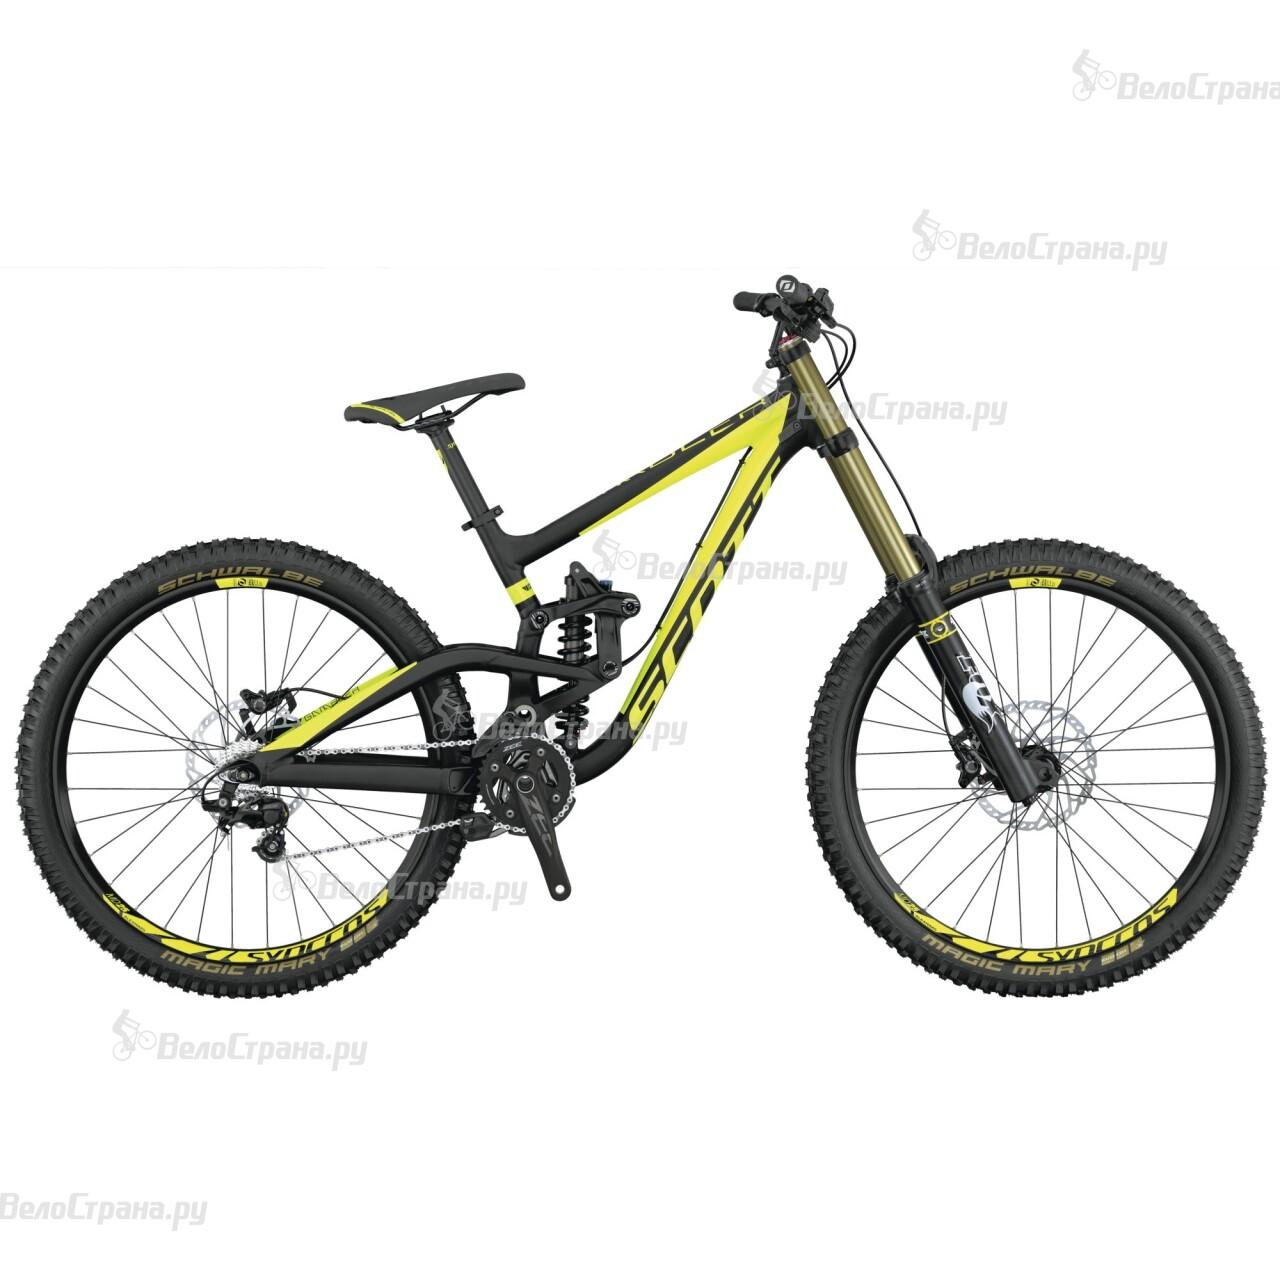 Велосипед Scott GAMBLER 720 (2015) велосипед scott gambler 720 2015